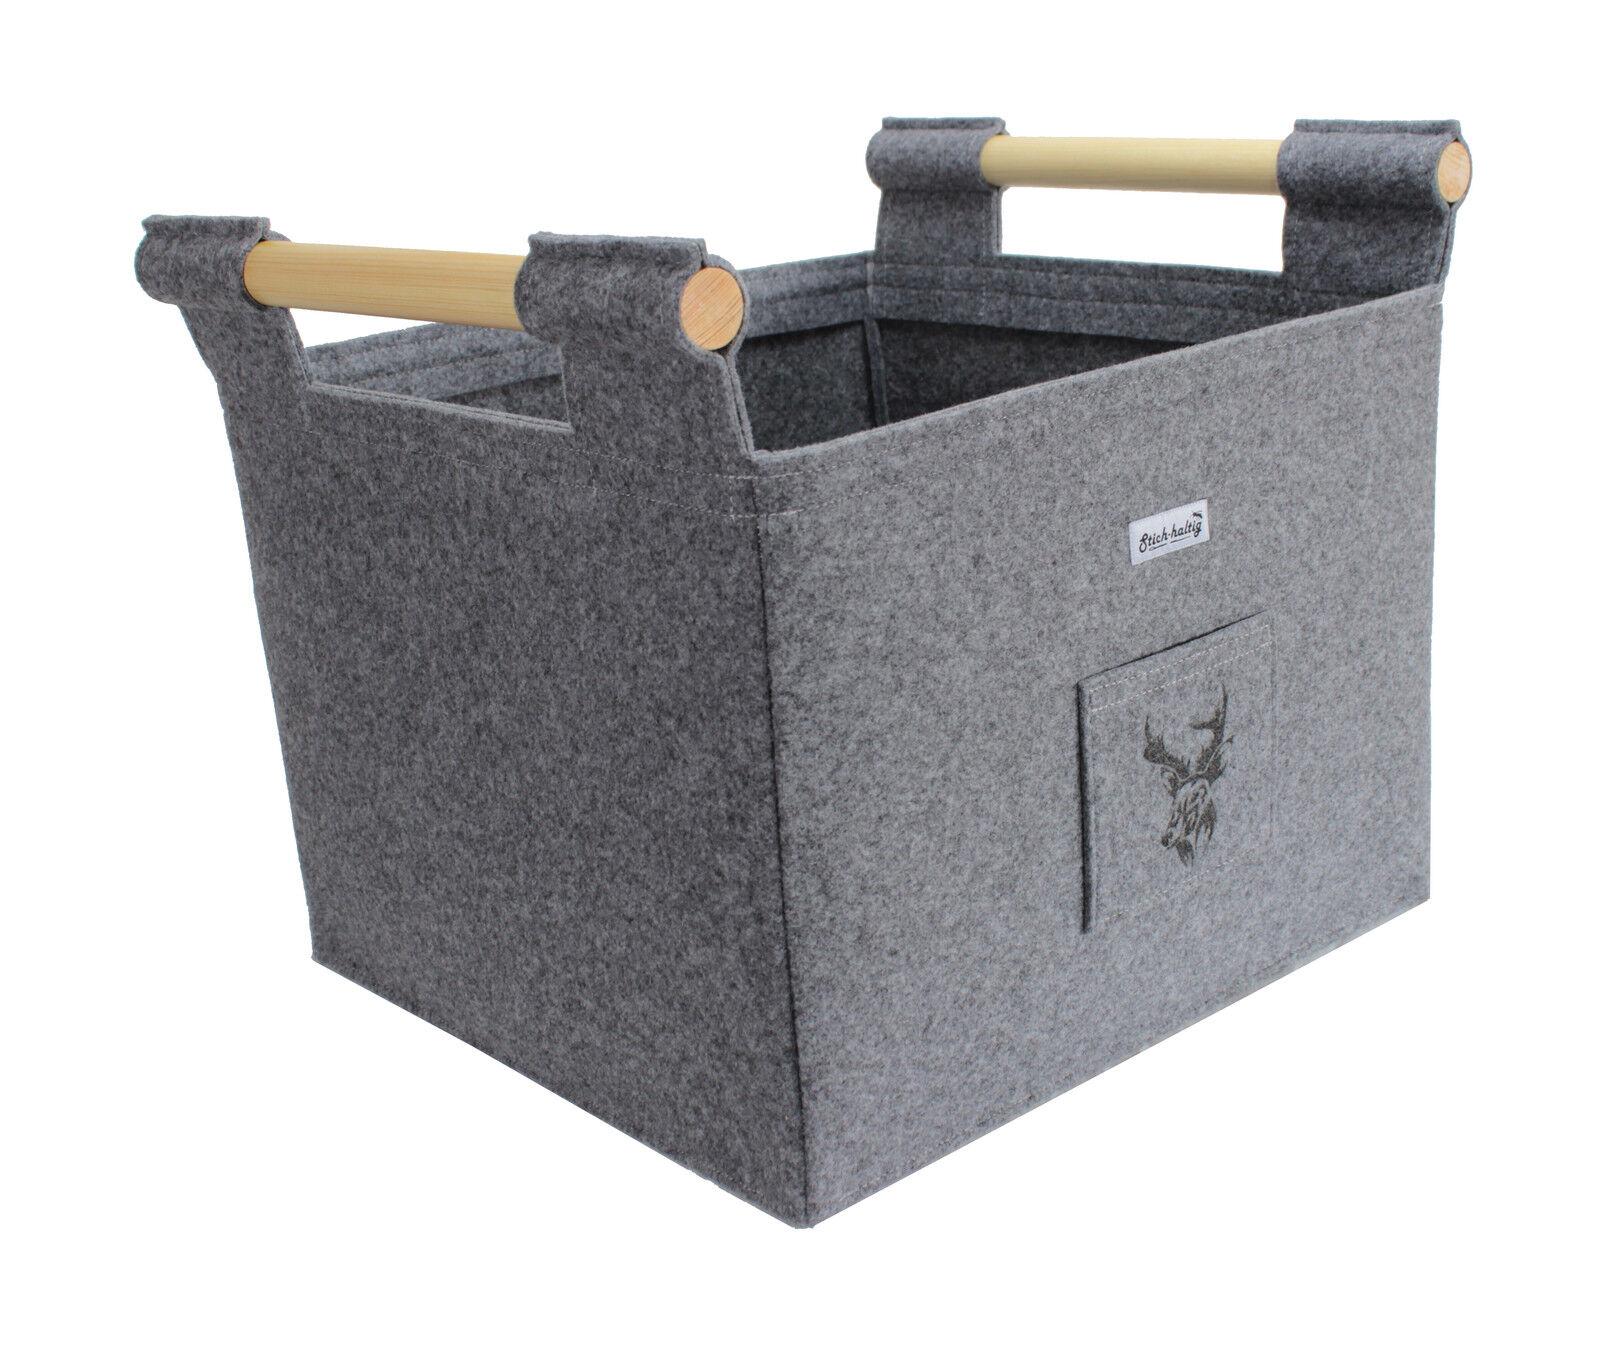 kaminkorb aus filz mit hirsch feuerholzkorb filzkorb kamin. Black Bedroom Furniture Sets. Home Design Ideas